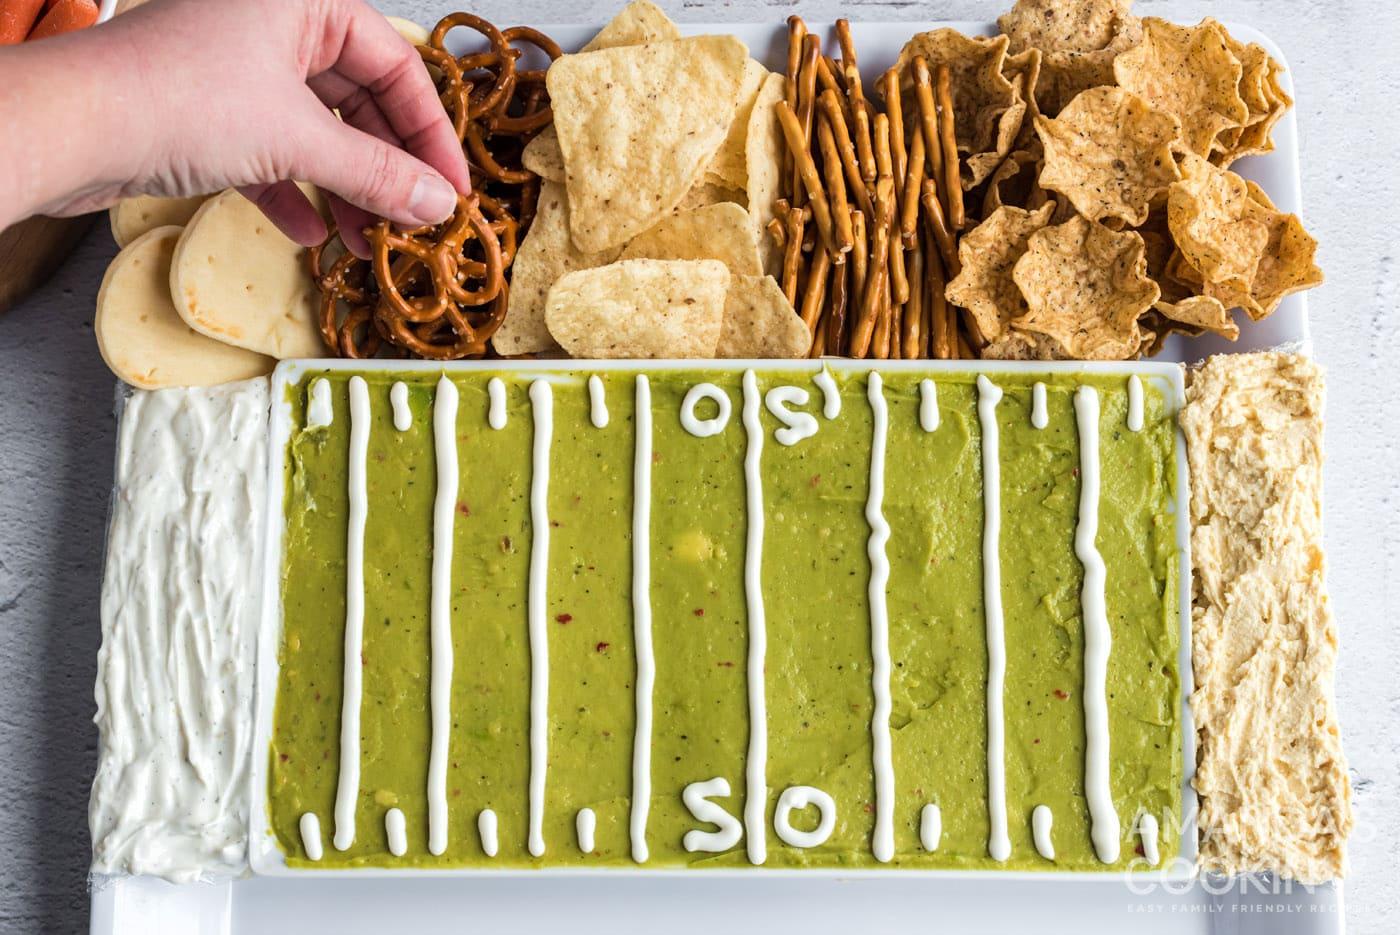 hand grabbing a pretzel on football party tray